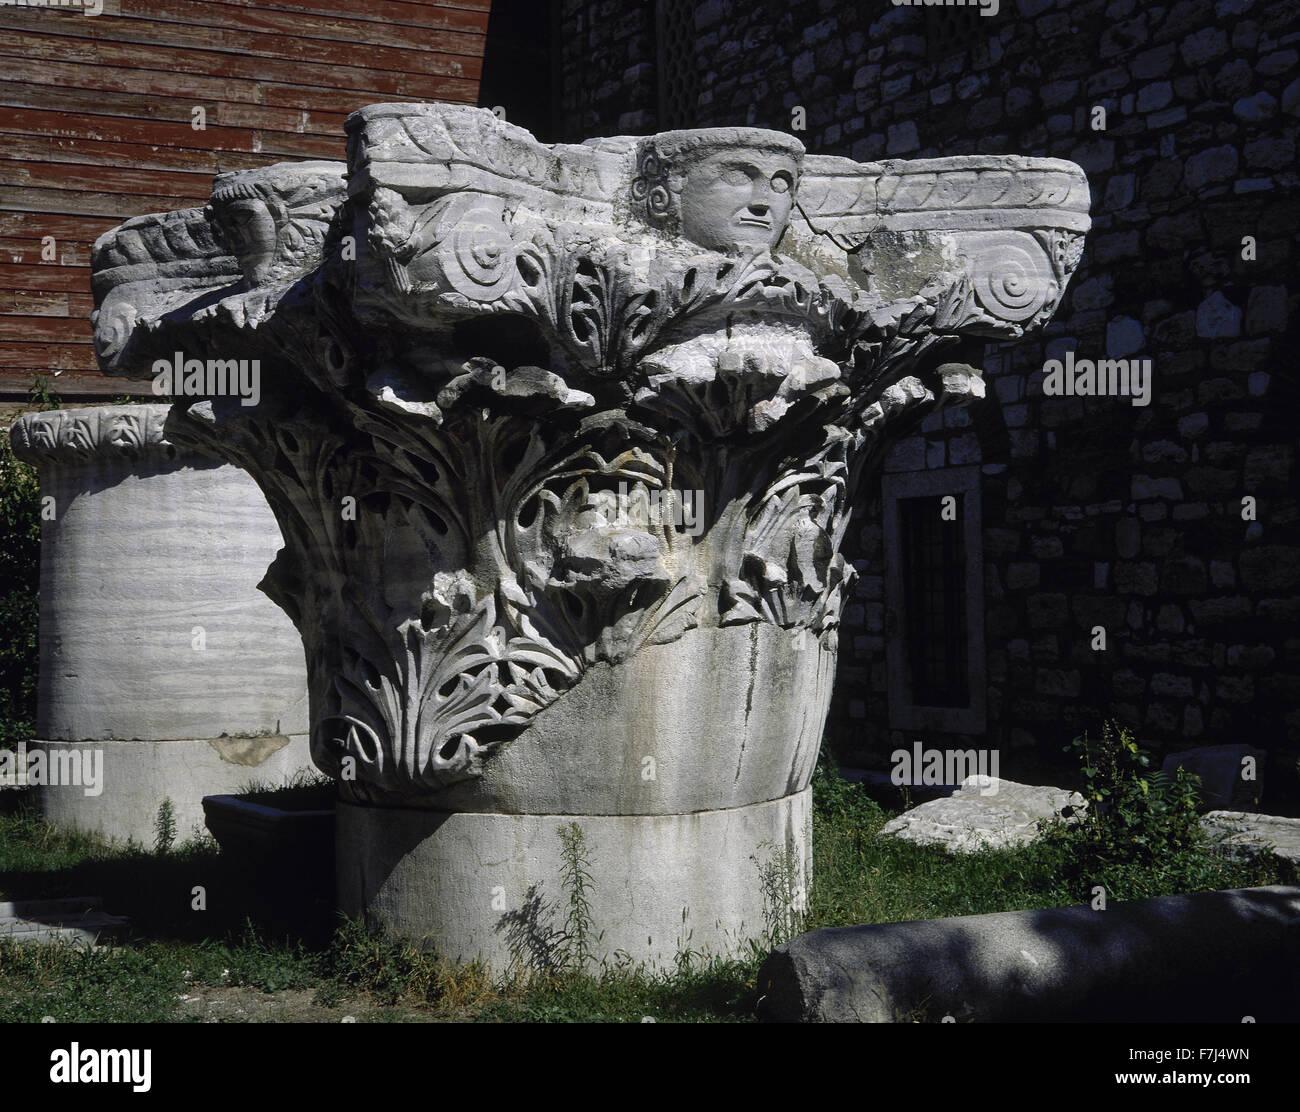 Corinthian capital with acanthus leaves. Garden of Topkapi Palace. Istanbul. Turkey. - Stock Image